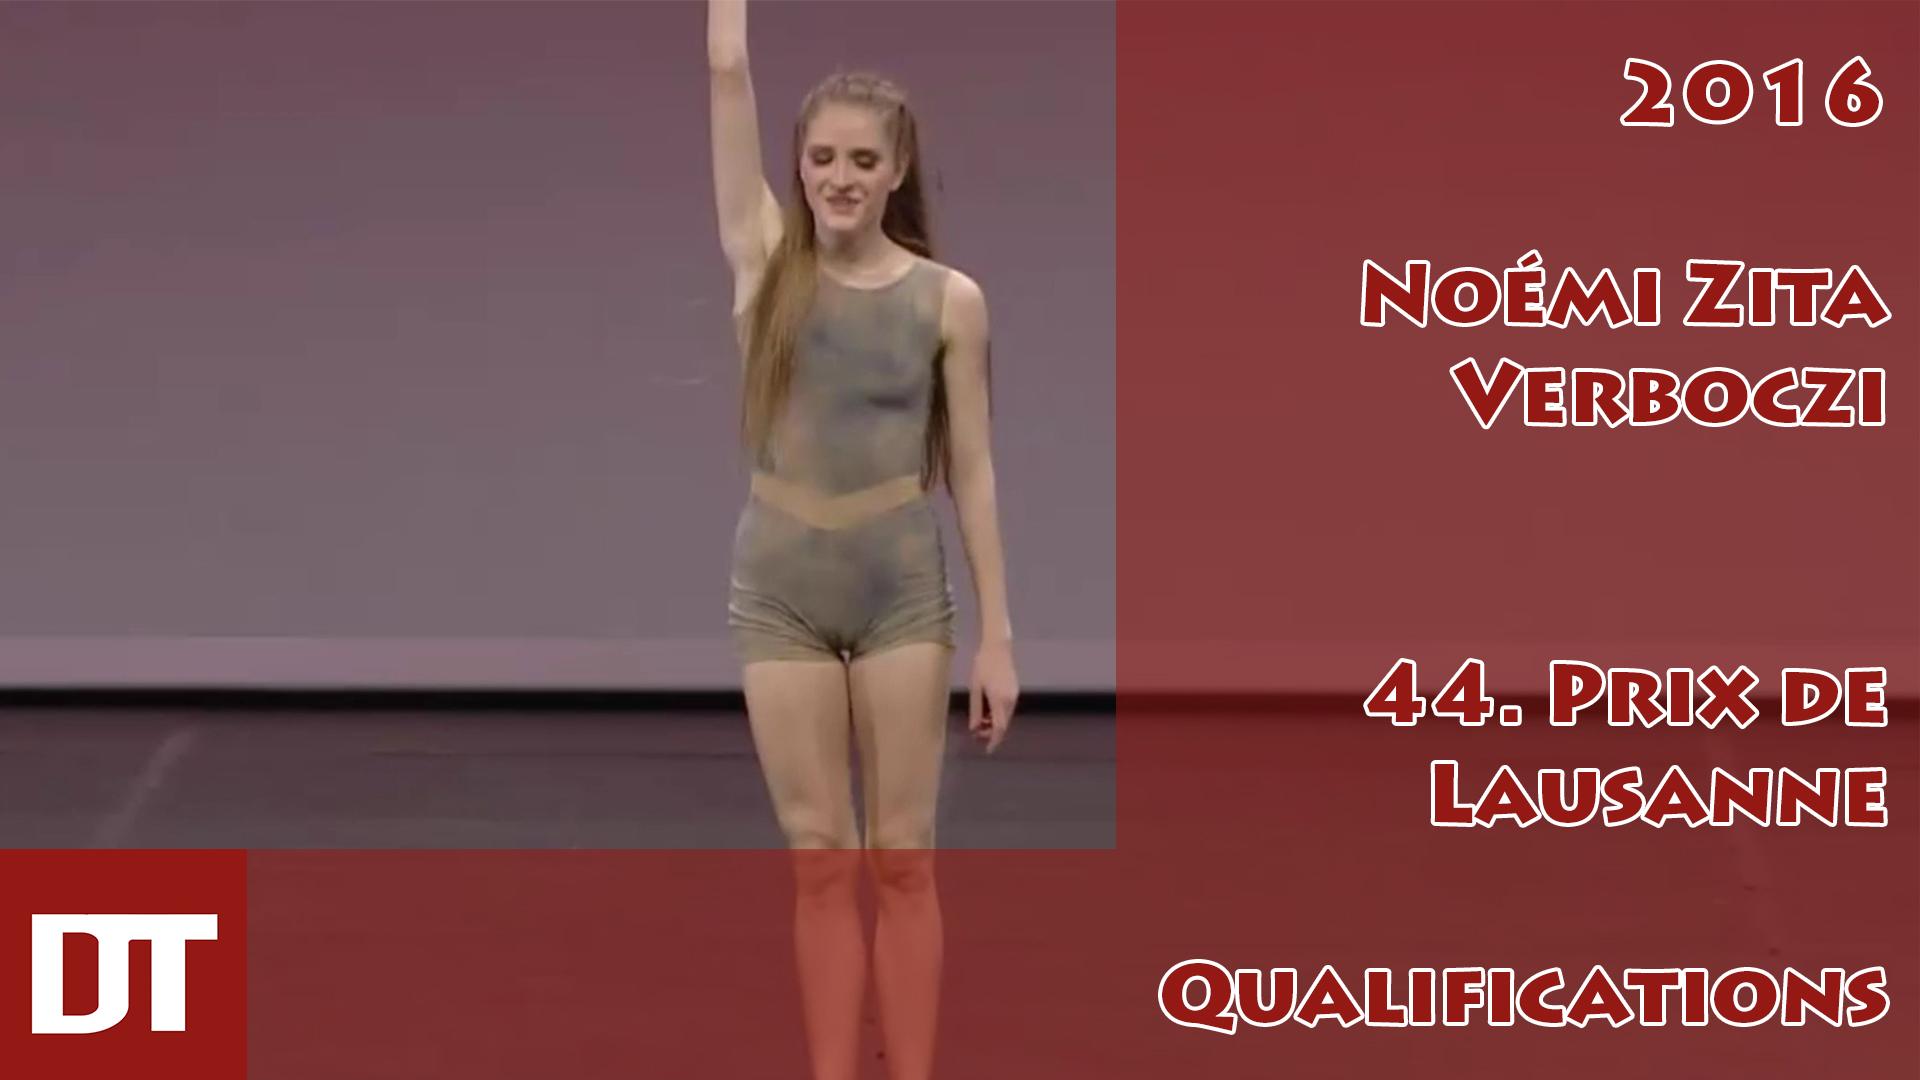 2016 – Noémi Zita Verboczi – 44. Prix de Lausanne – Qualifications